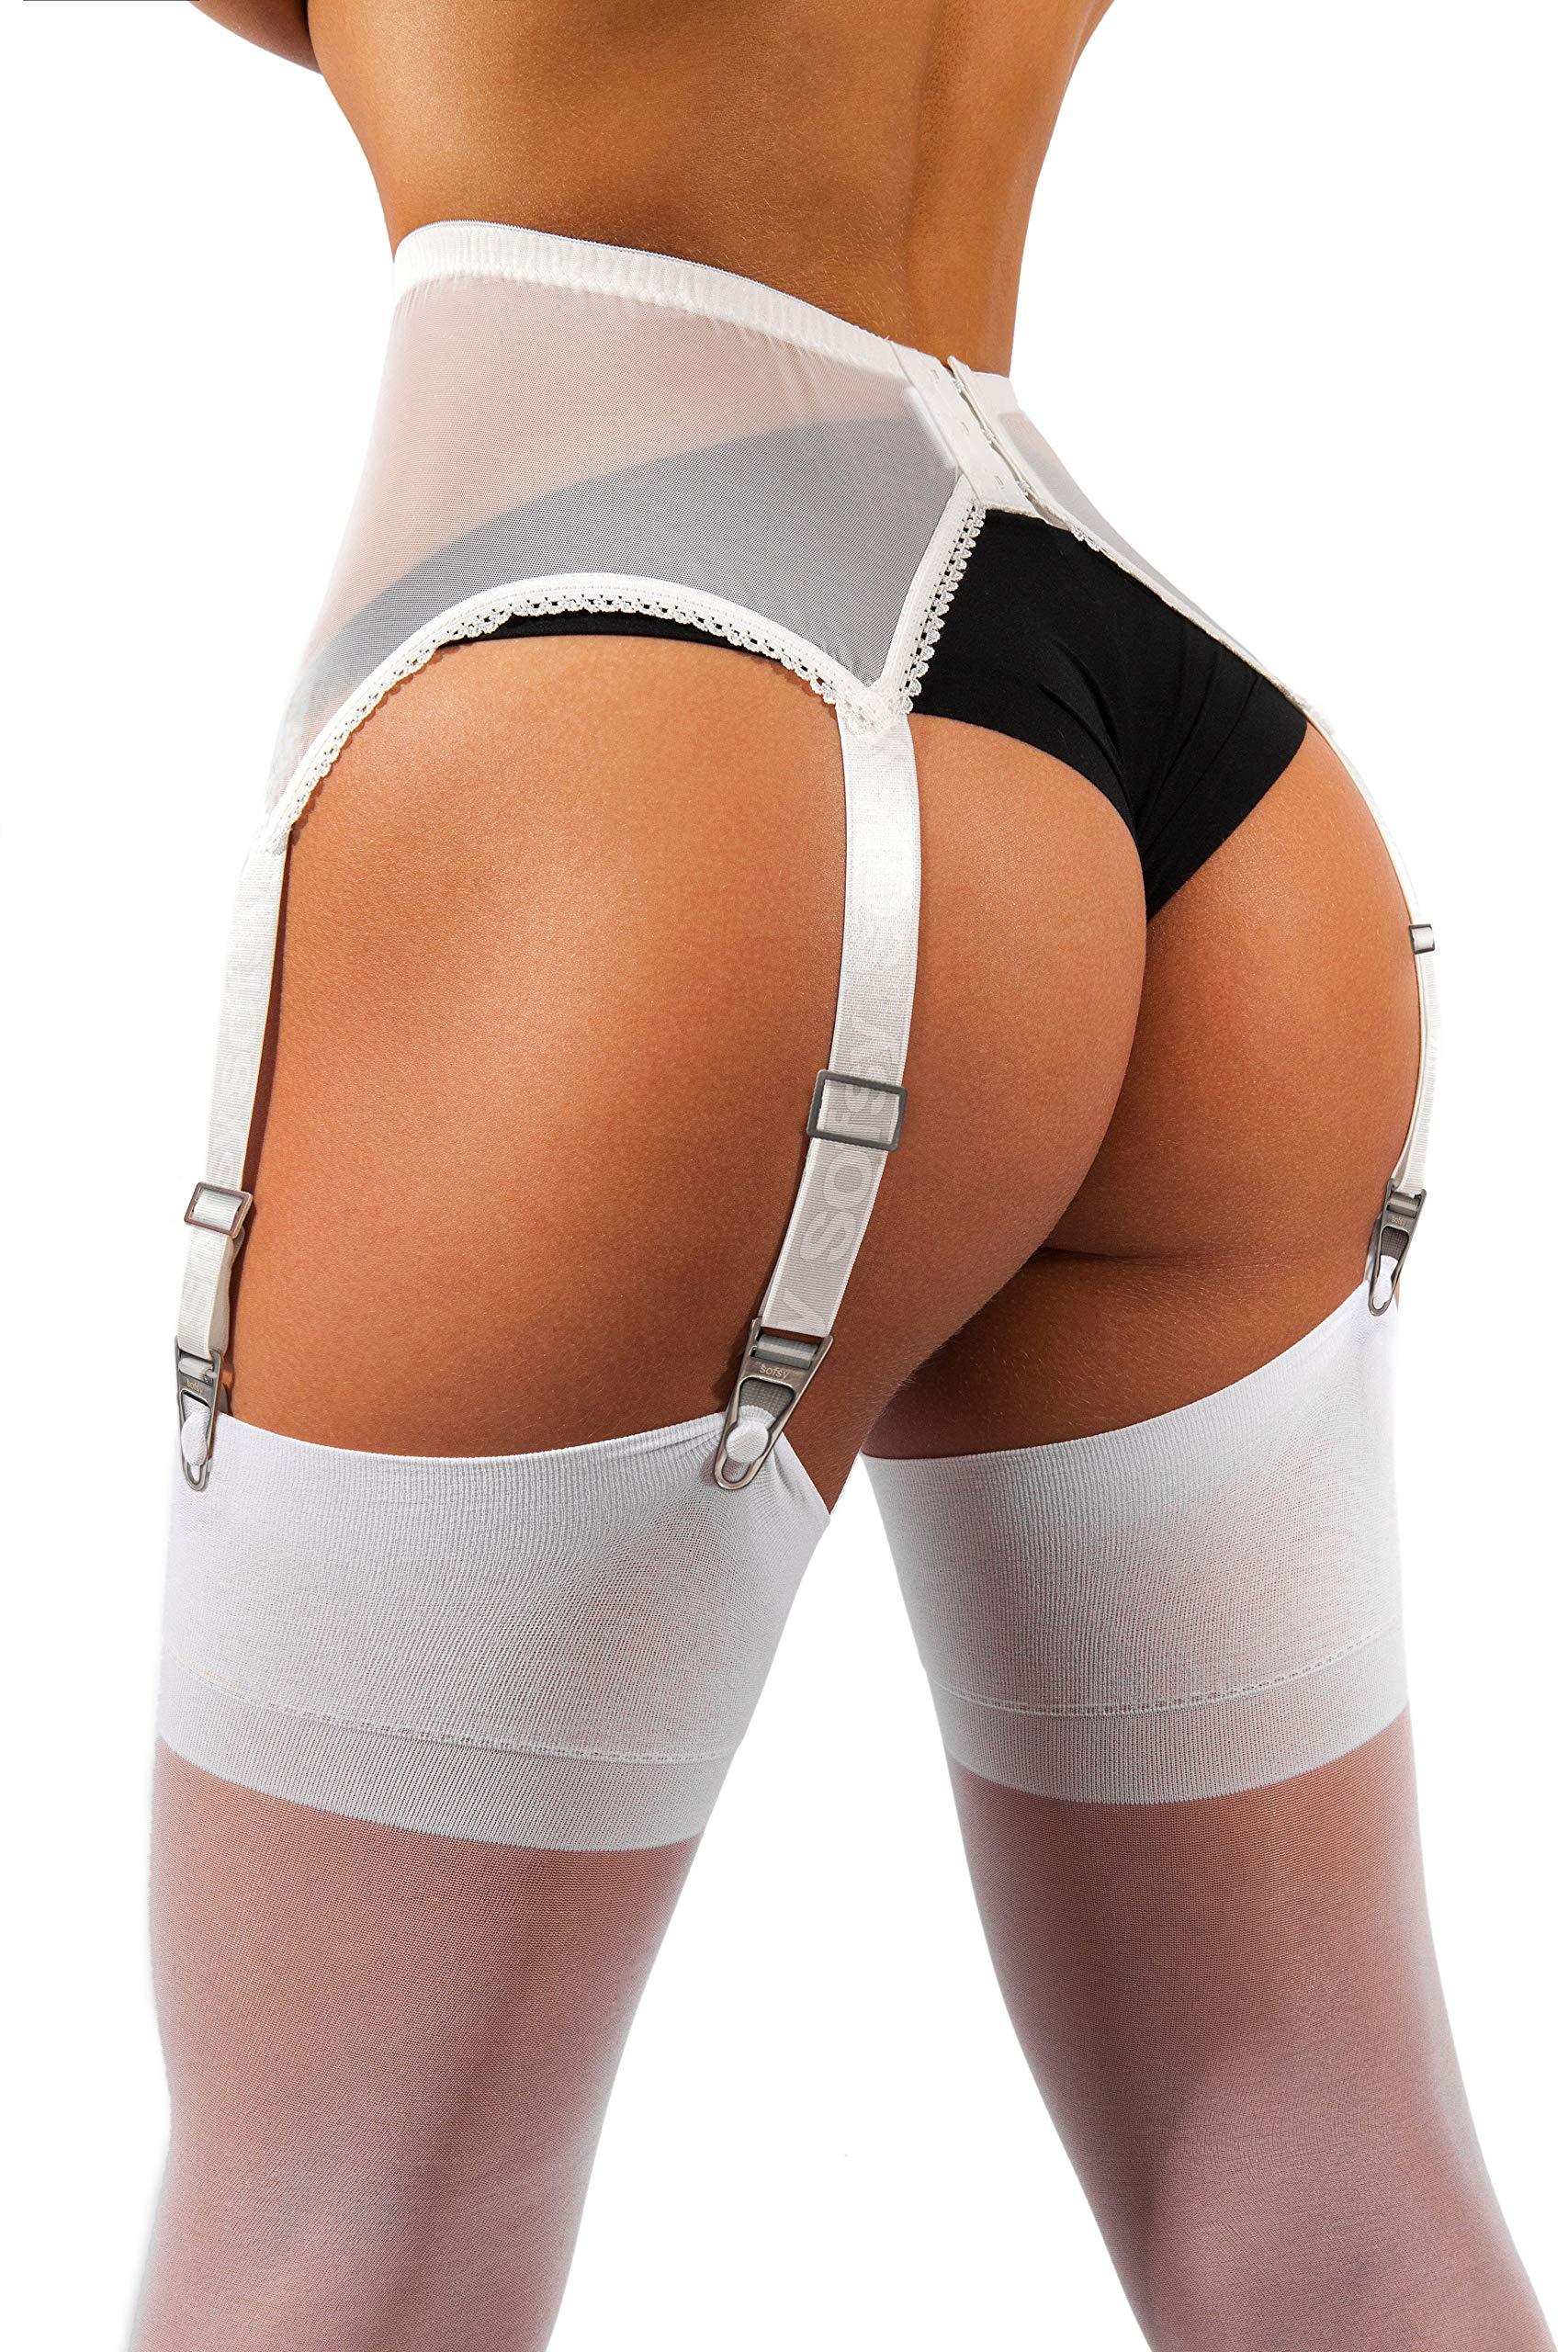 b0585a8657 sofsy Sheer Thigh High Suspender Stockings for Garter Belt and Suspender  Belt Plain 15 Den